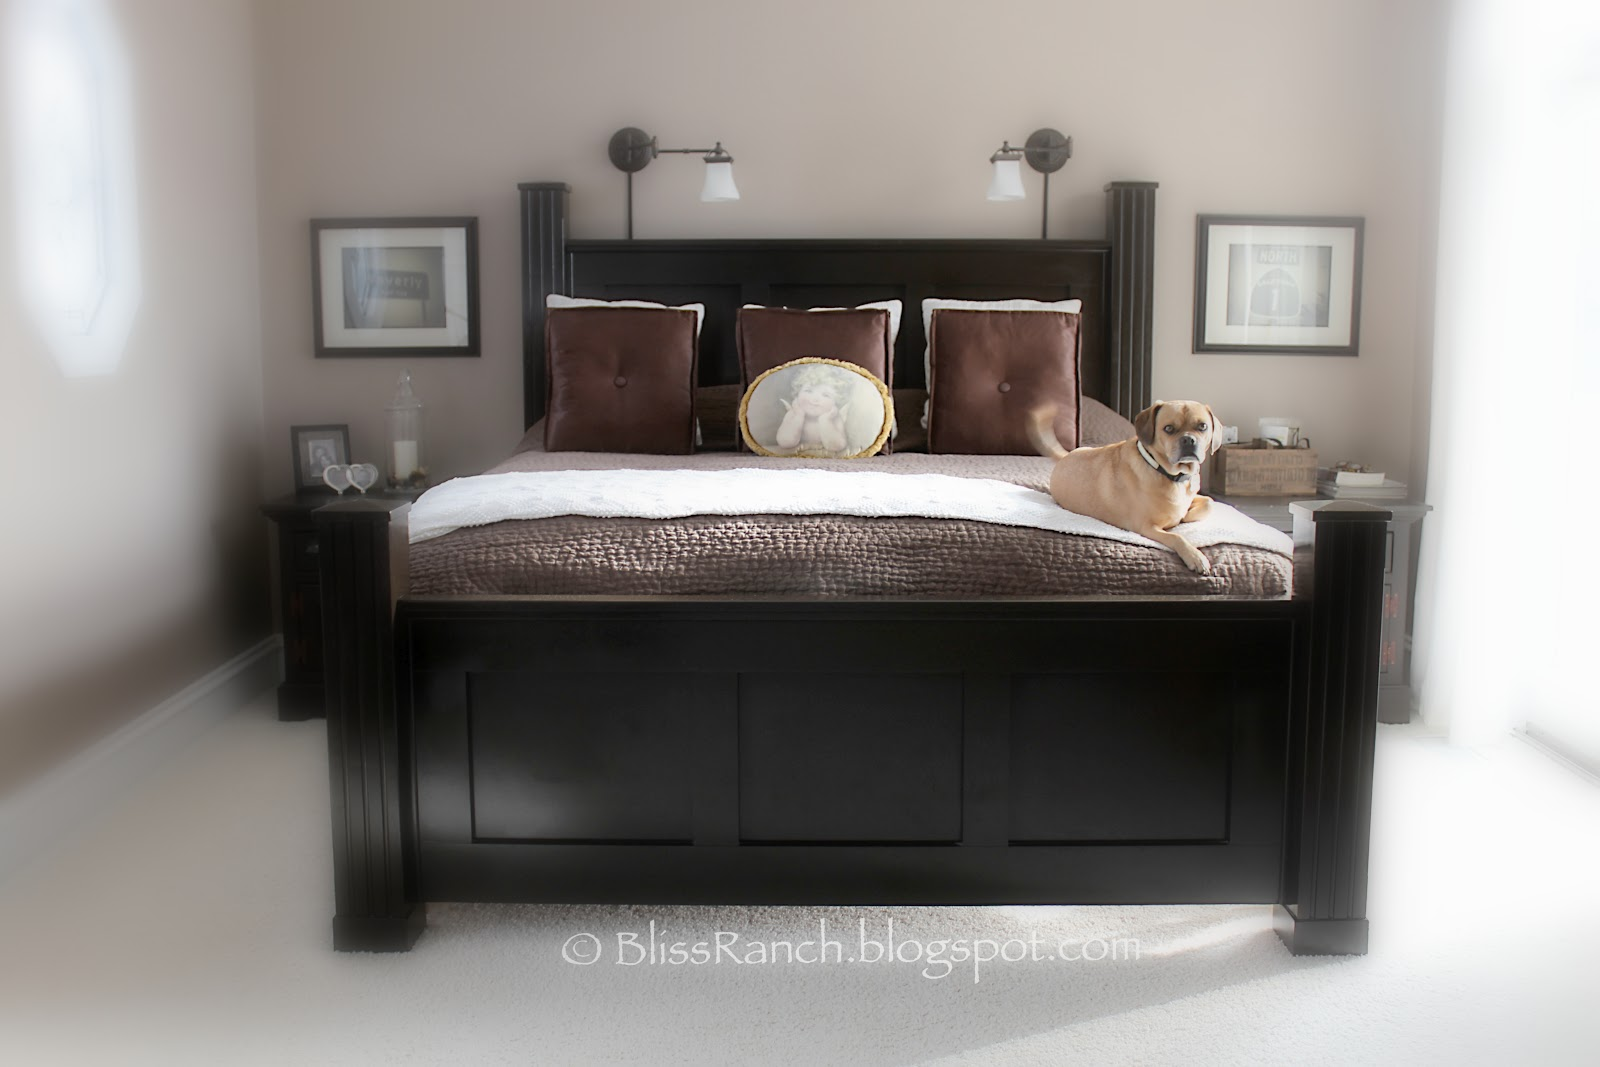 Custom Made Bed Bliss Ranch.com #5C4D46